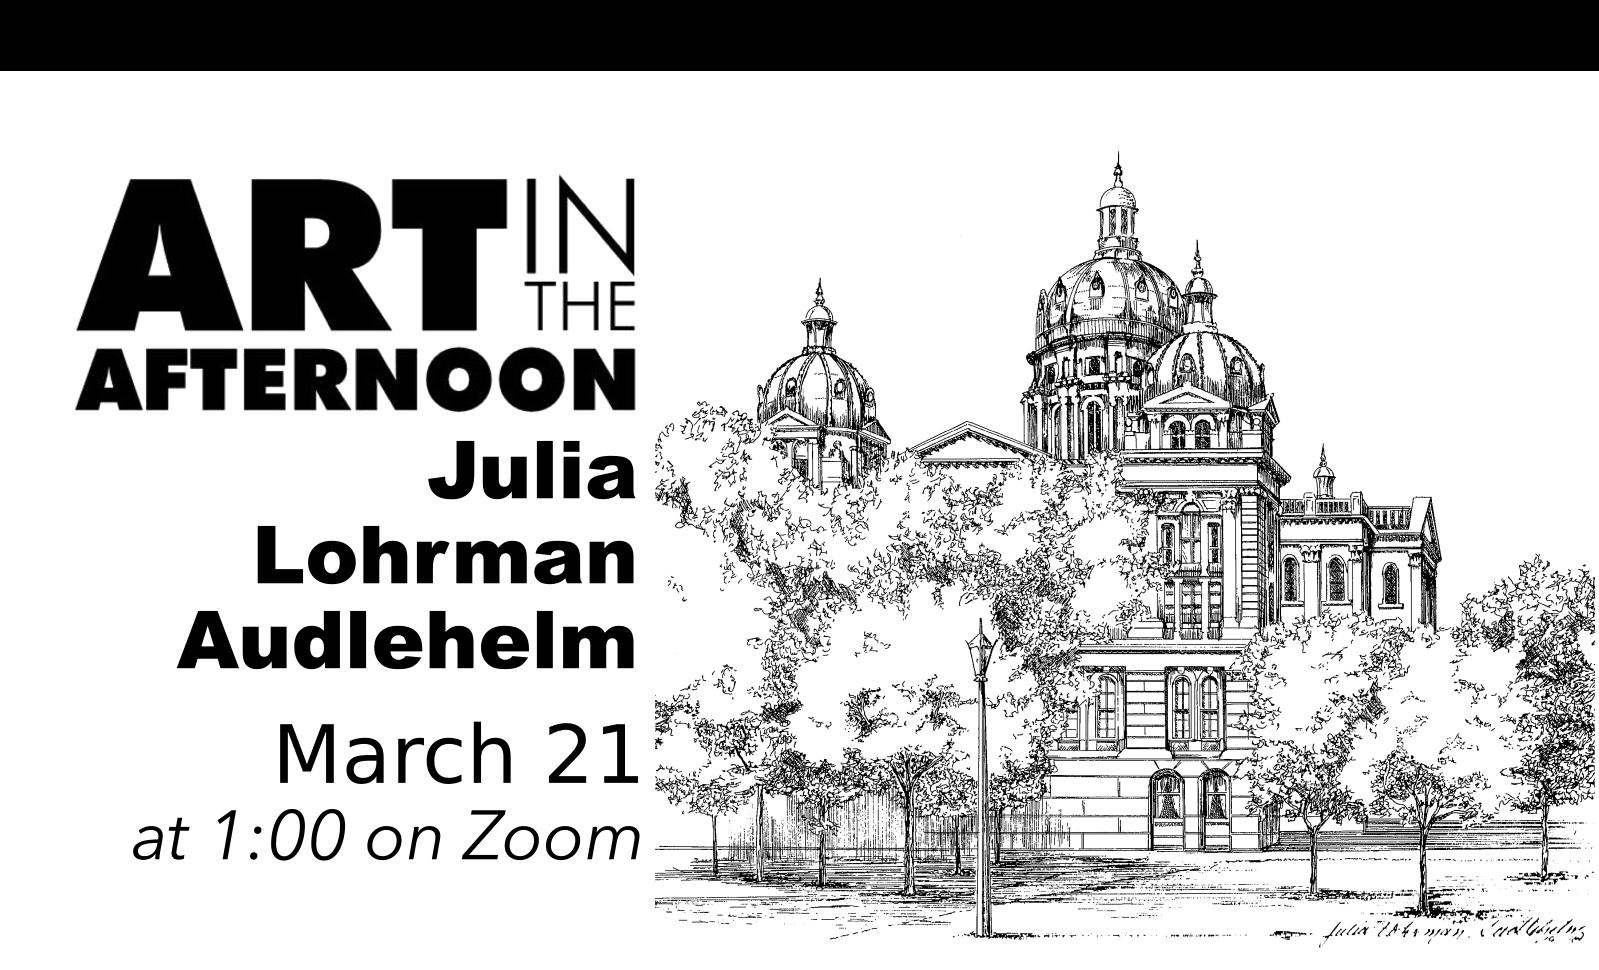 Art ibn the Afternoon | Julia Lohrman Audlehelm